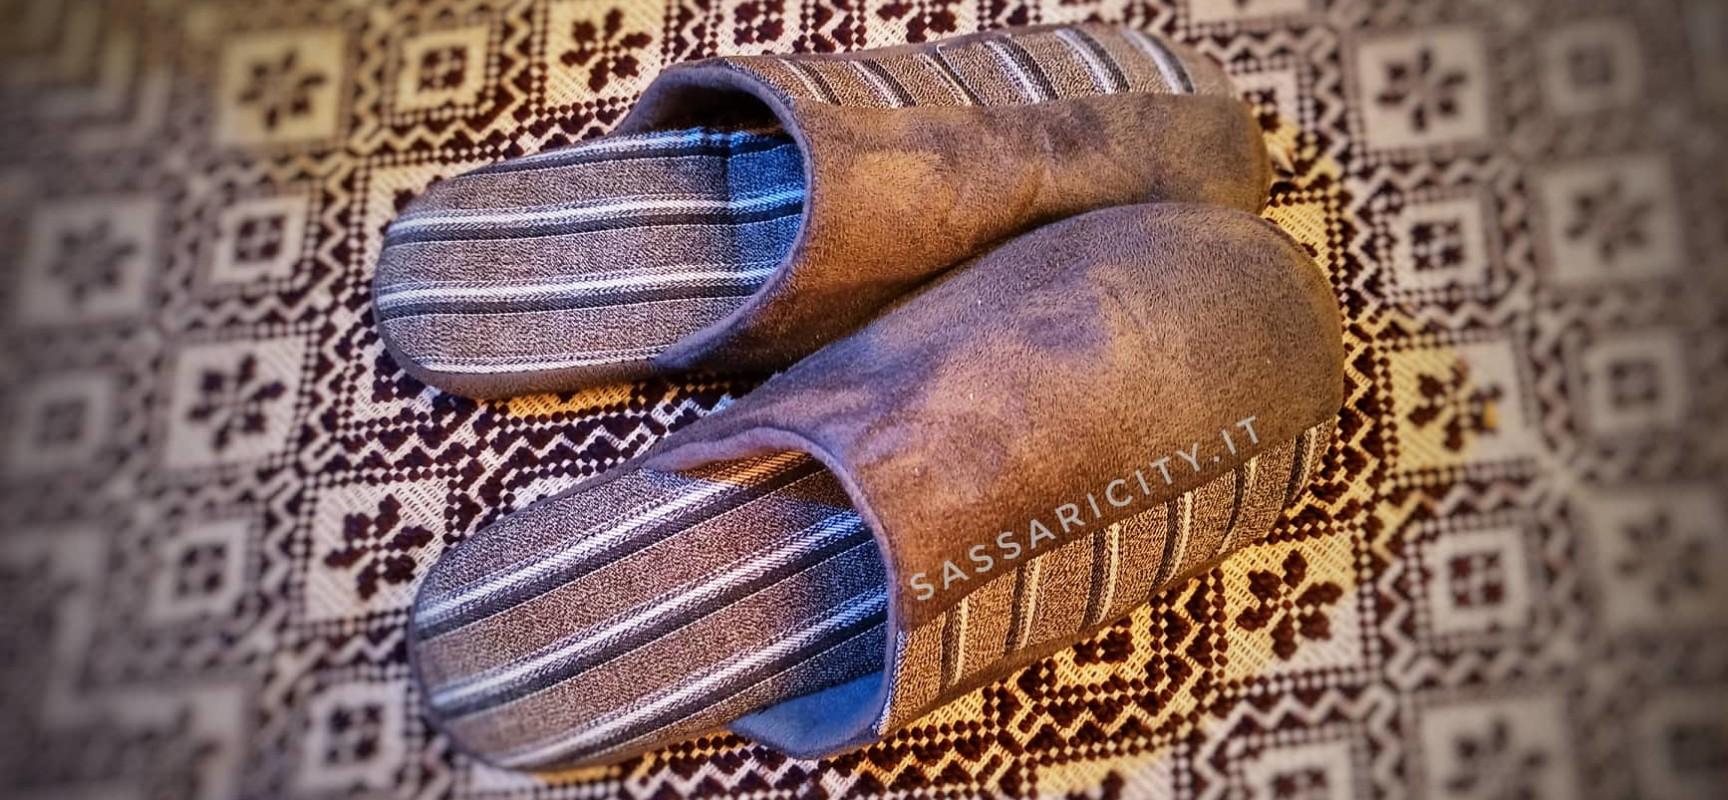 Le nuove pantofole